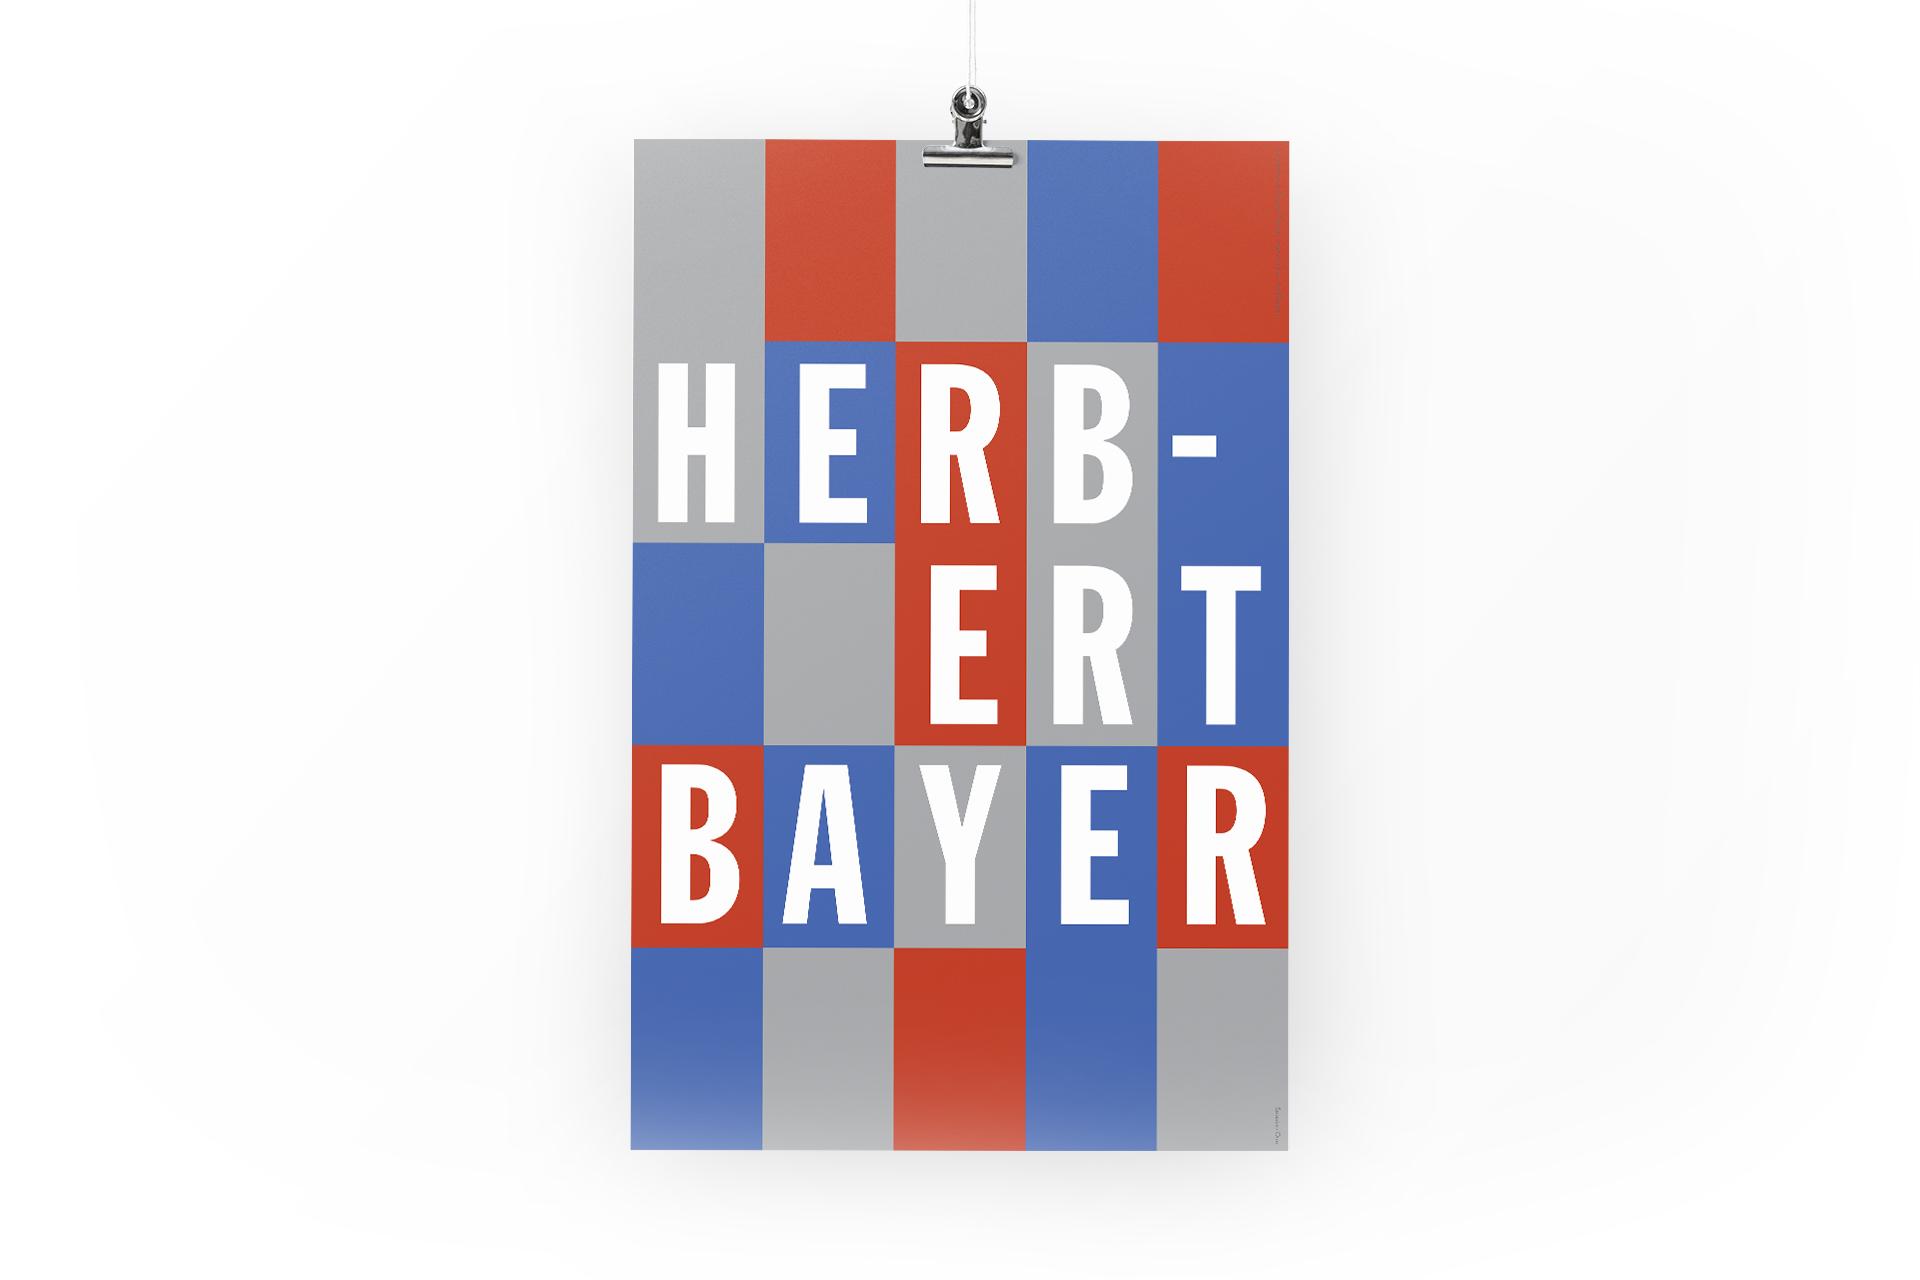 01_Bayer.jpg